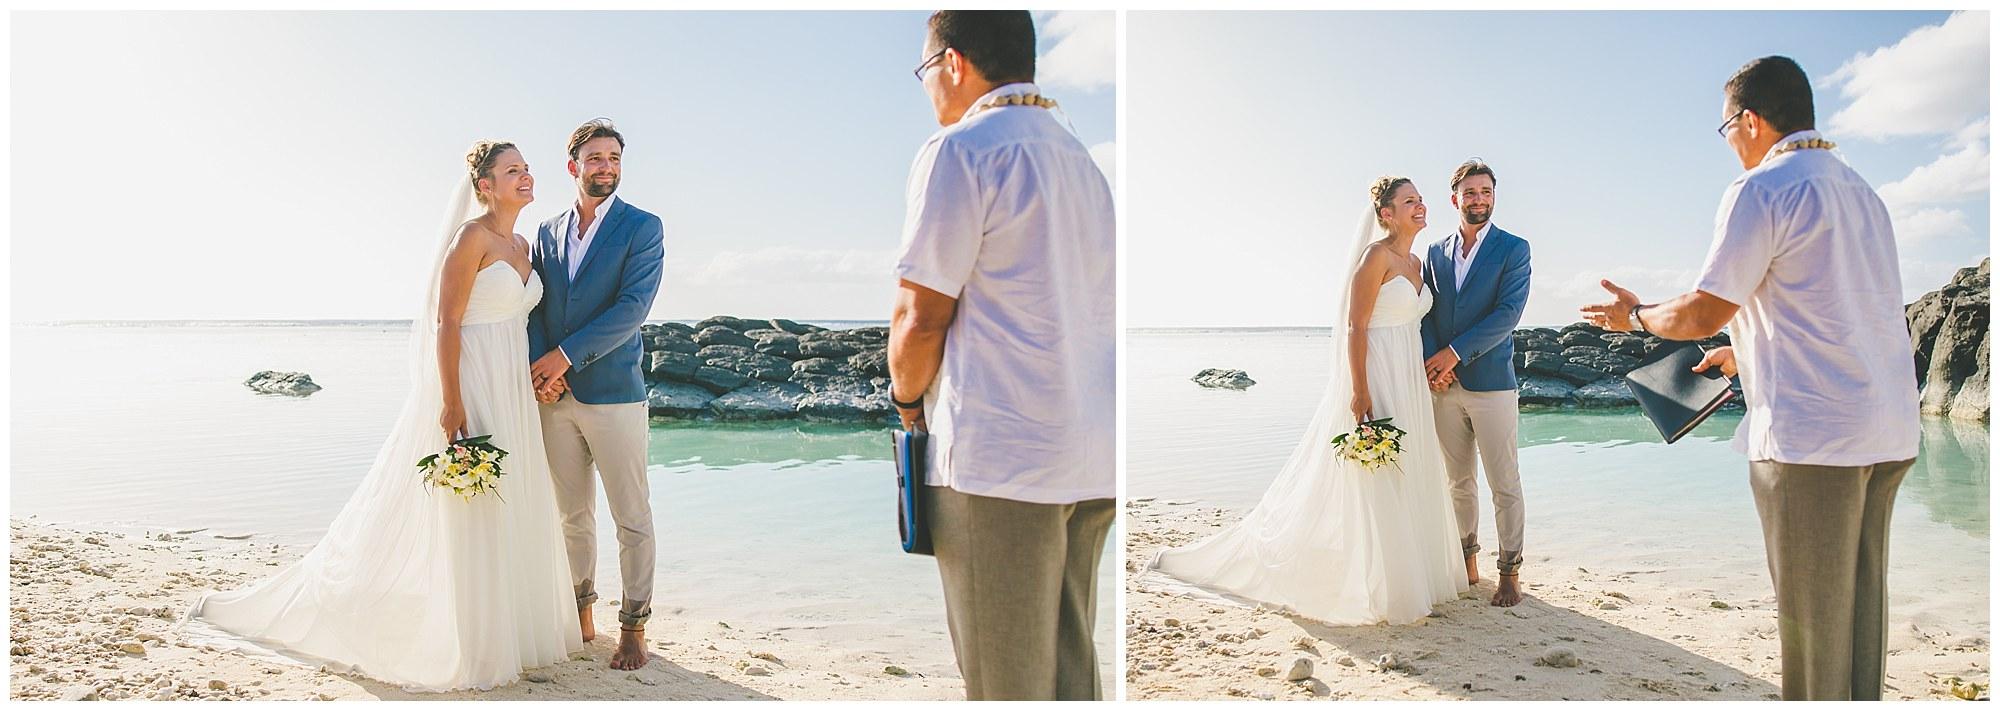 wedding vows rarotonga